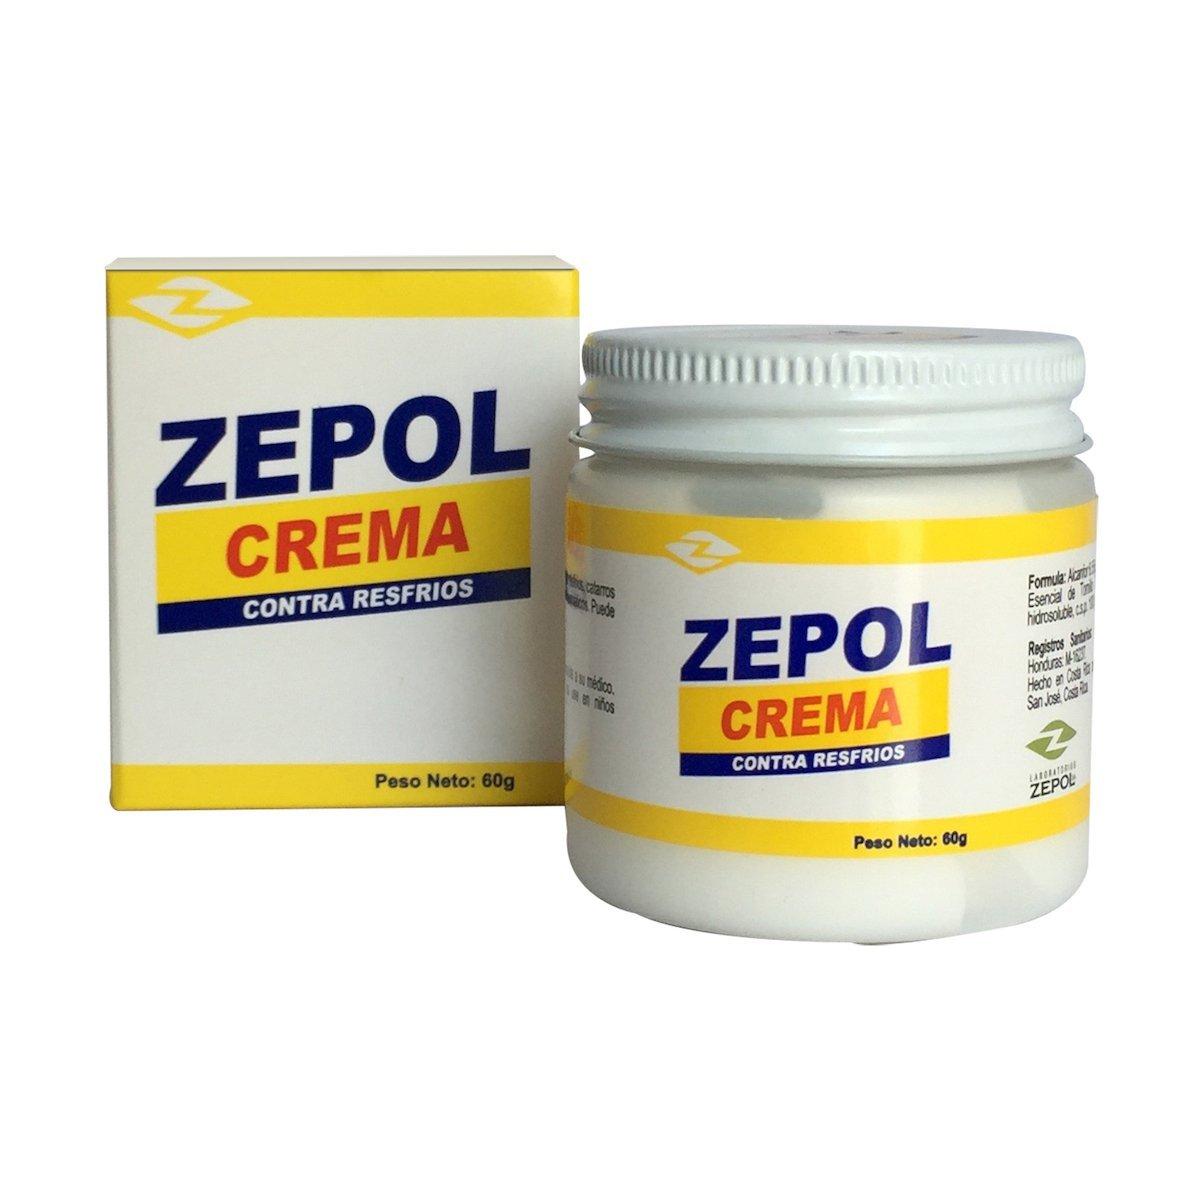 Zepol Cream Colds - 2.1 Oz - 2 Pack by Zepol